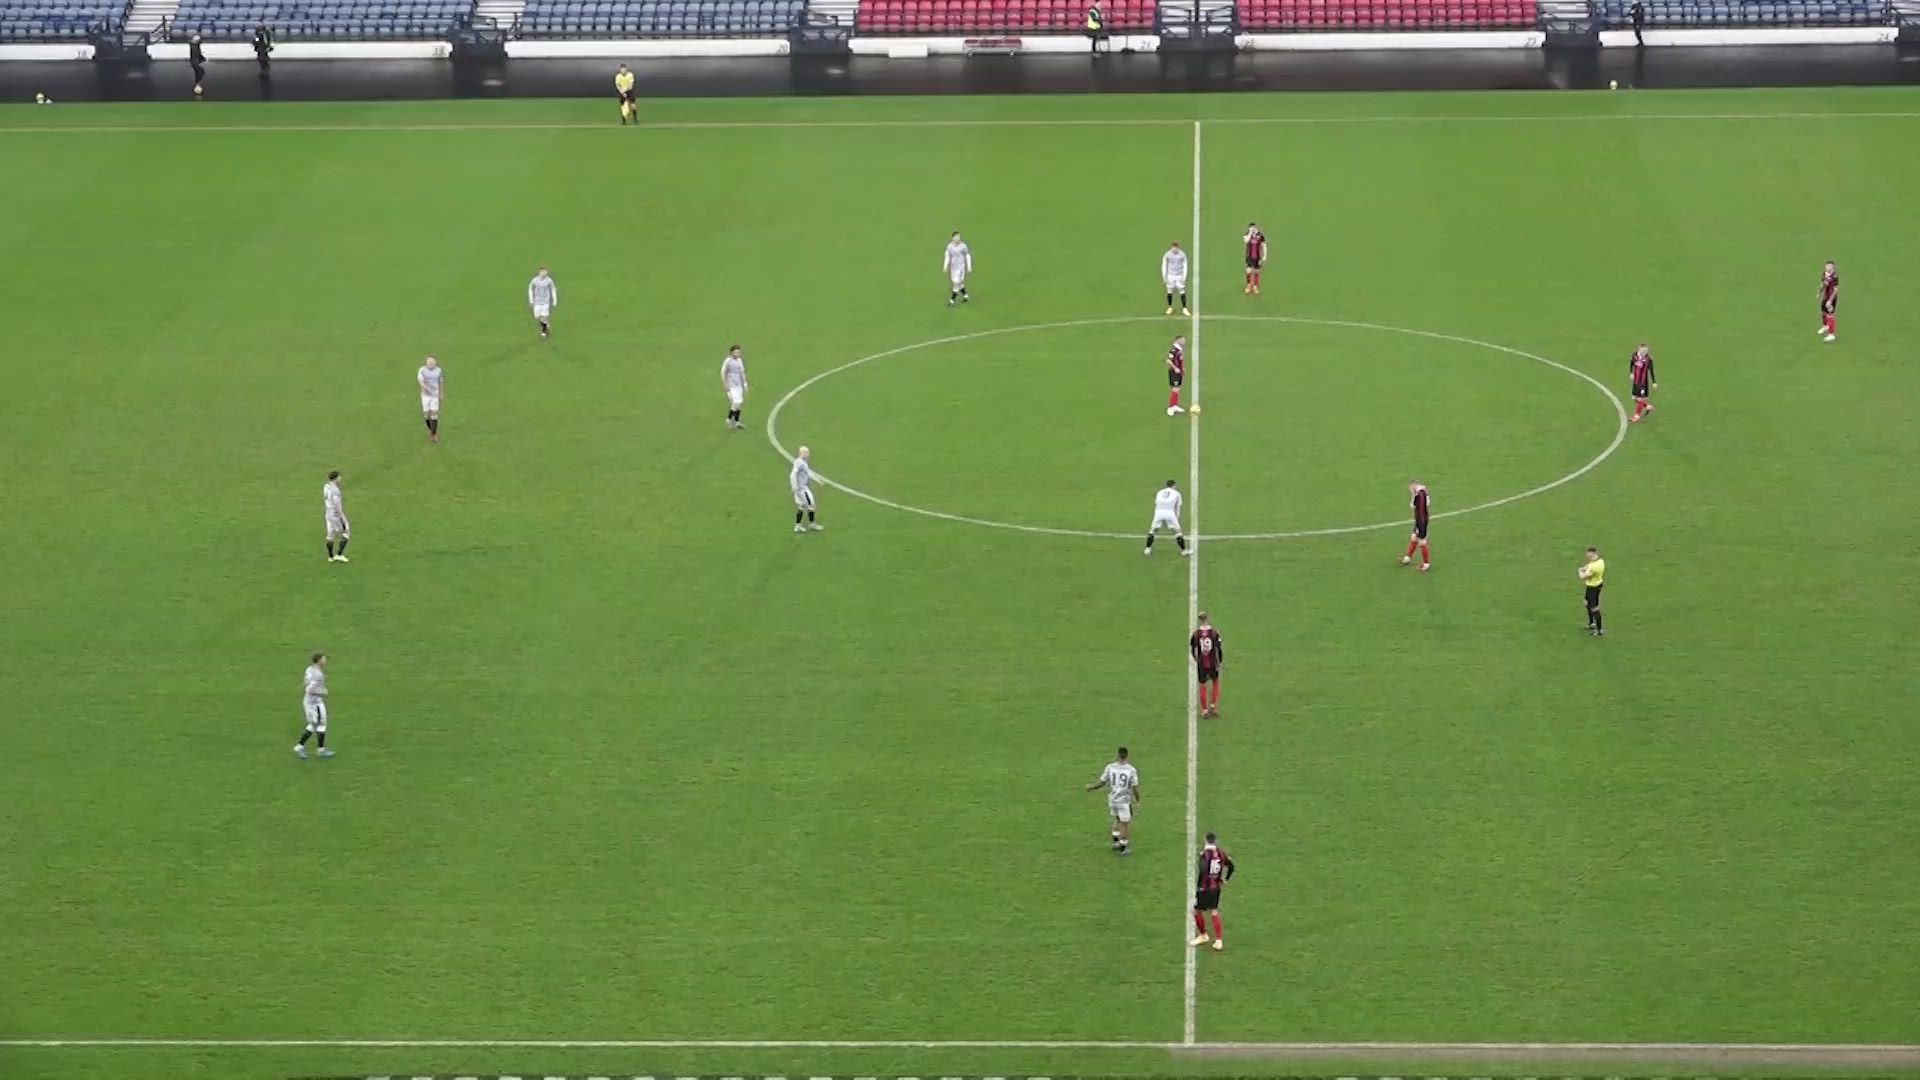 Football/Soccer Match Tagging Tutorial